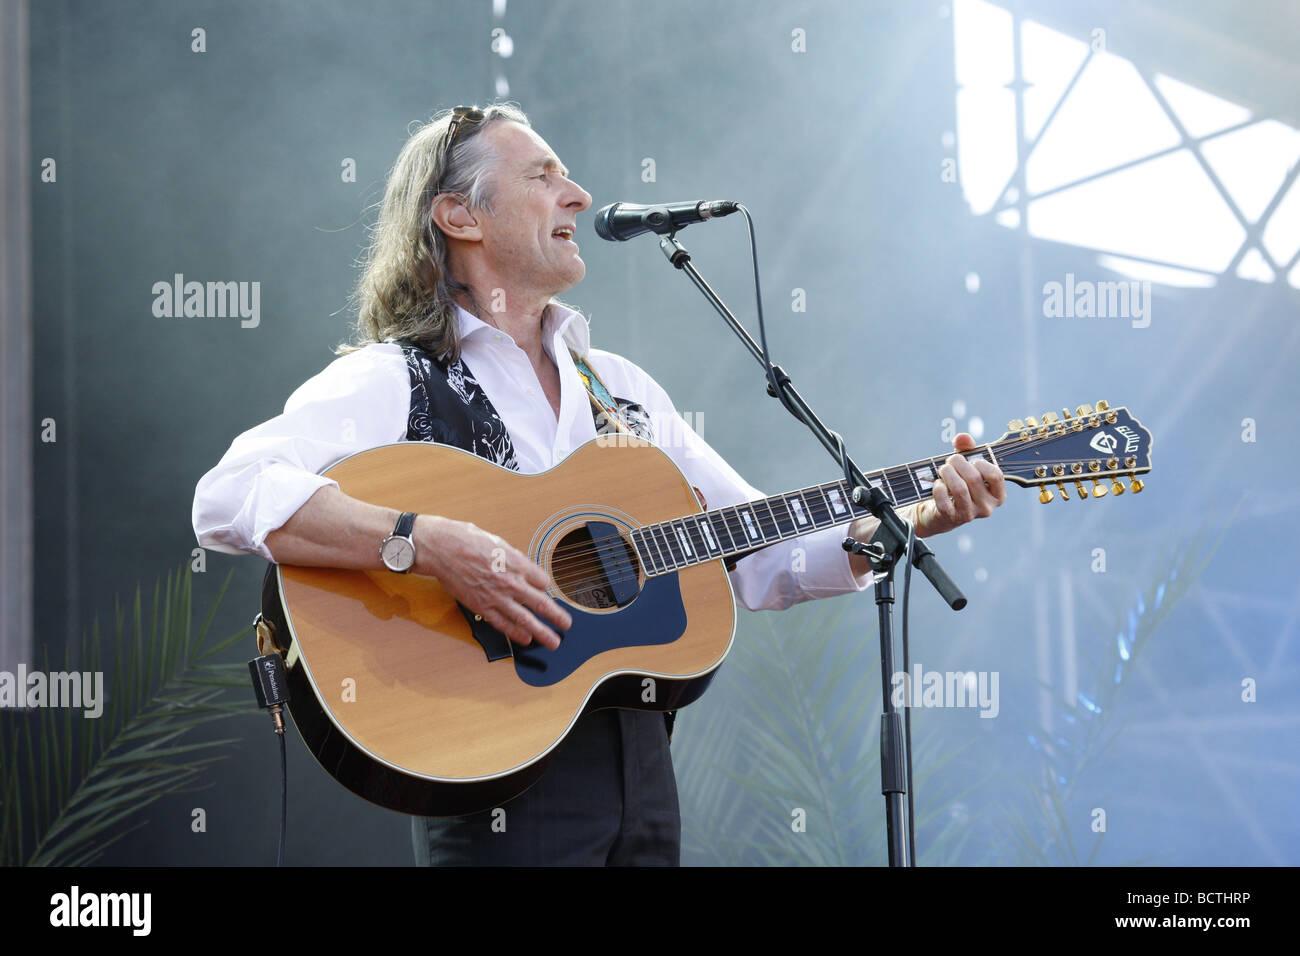 Roger Hodgson, British musician and songwriter, Open Air Festival, Muehldorf am Inn, Bavaria, Germany Stock Photo